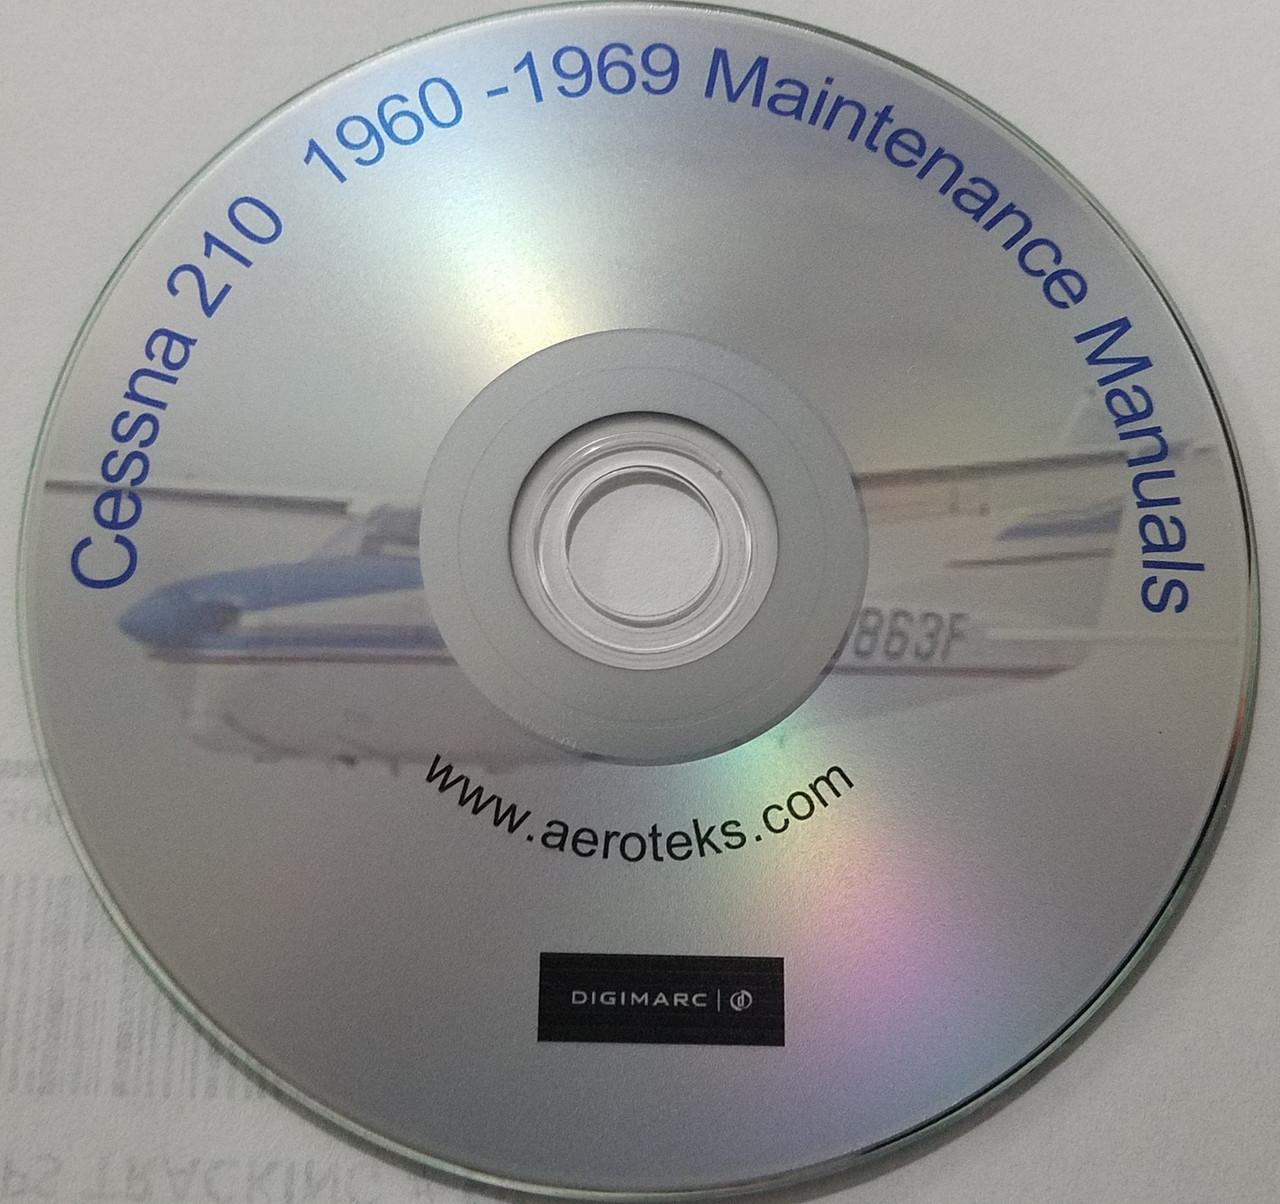 Cessna Aircraft Maintenance Service manuals